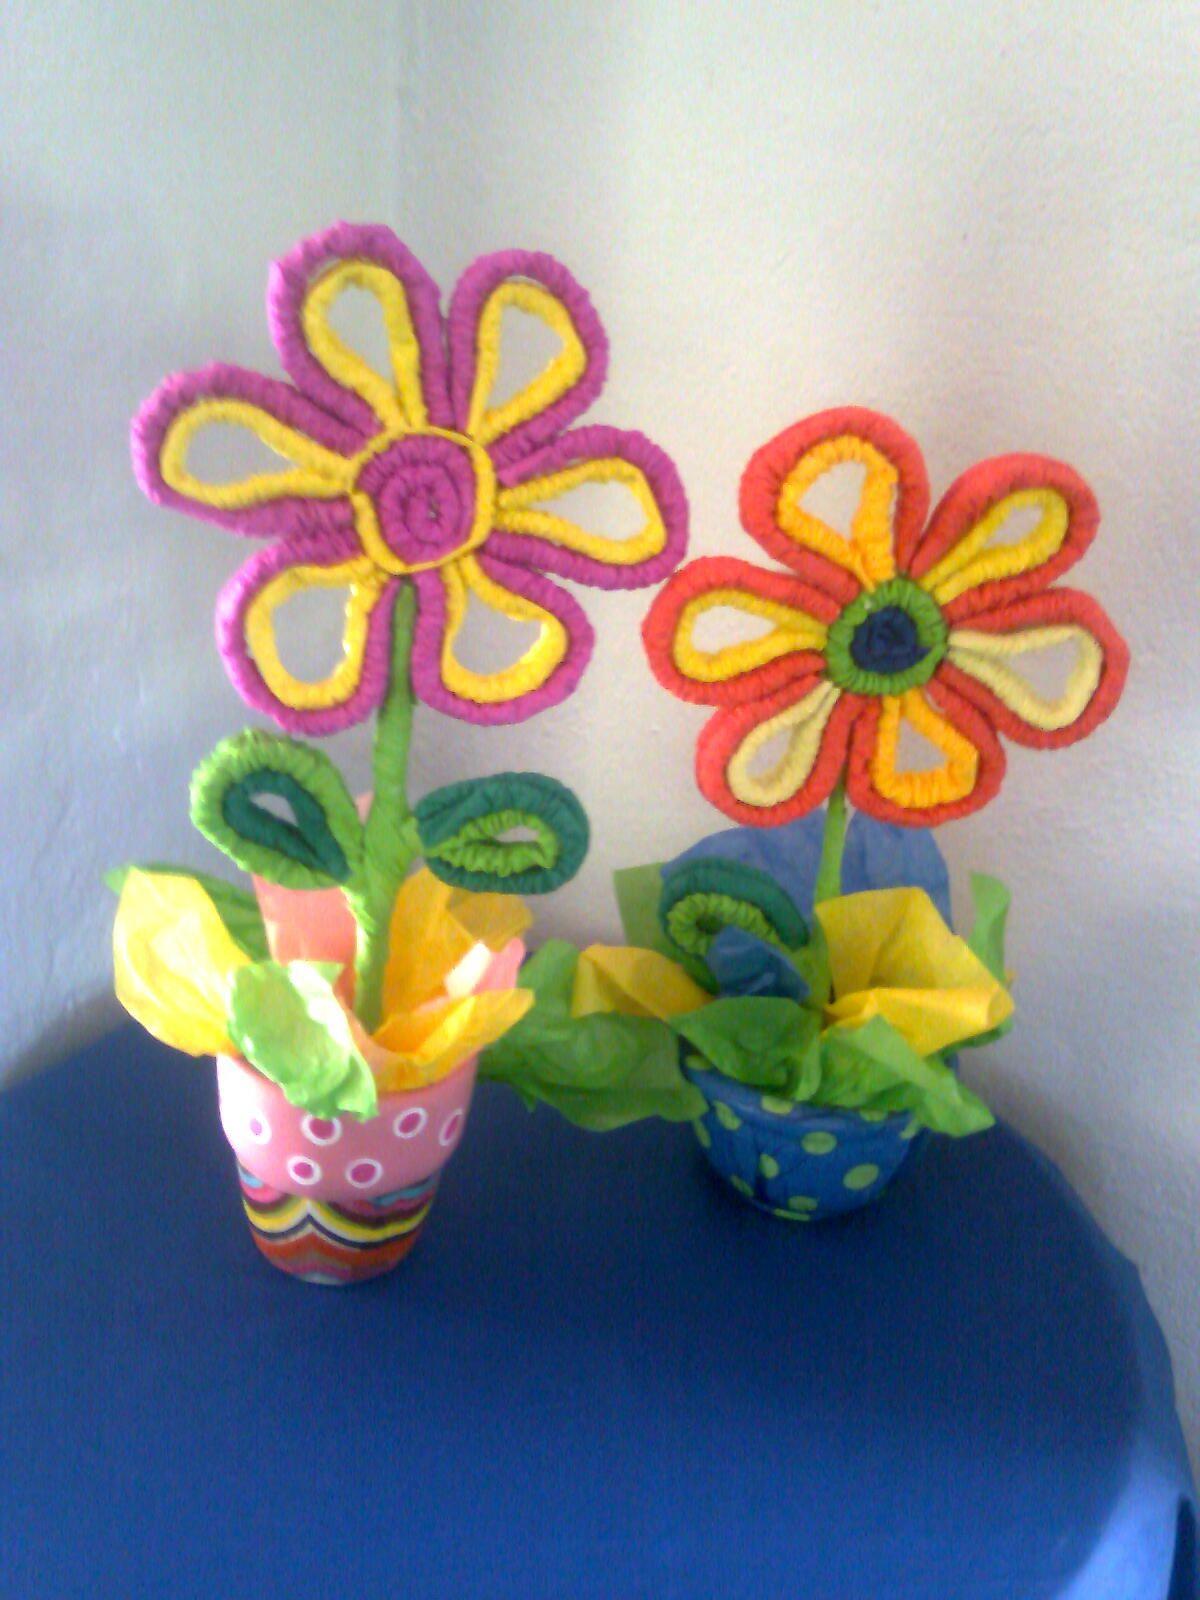 Flores Papel Crepe Manualidades Pinterest Projects To Try - Flores-de-papel-crepe